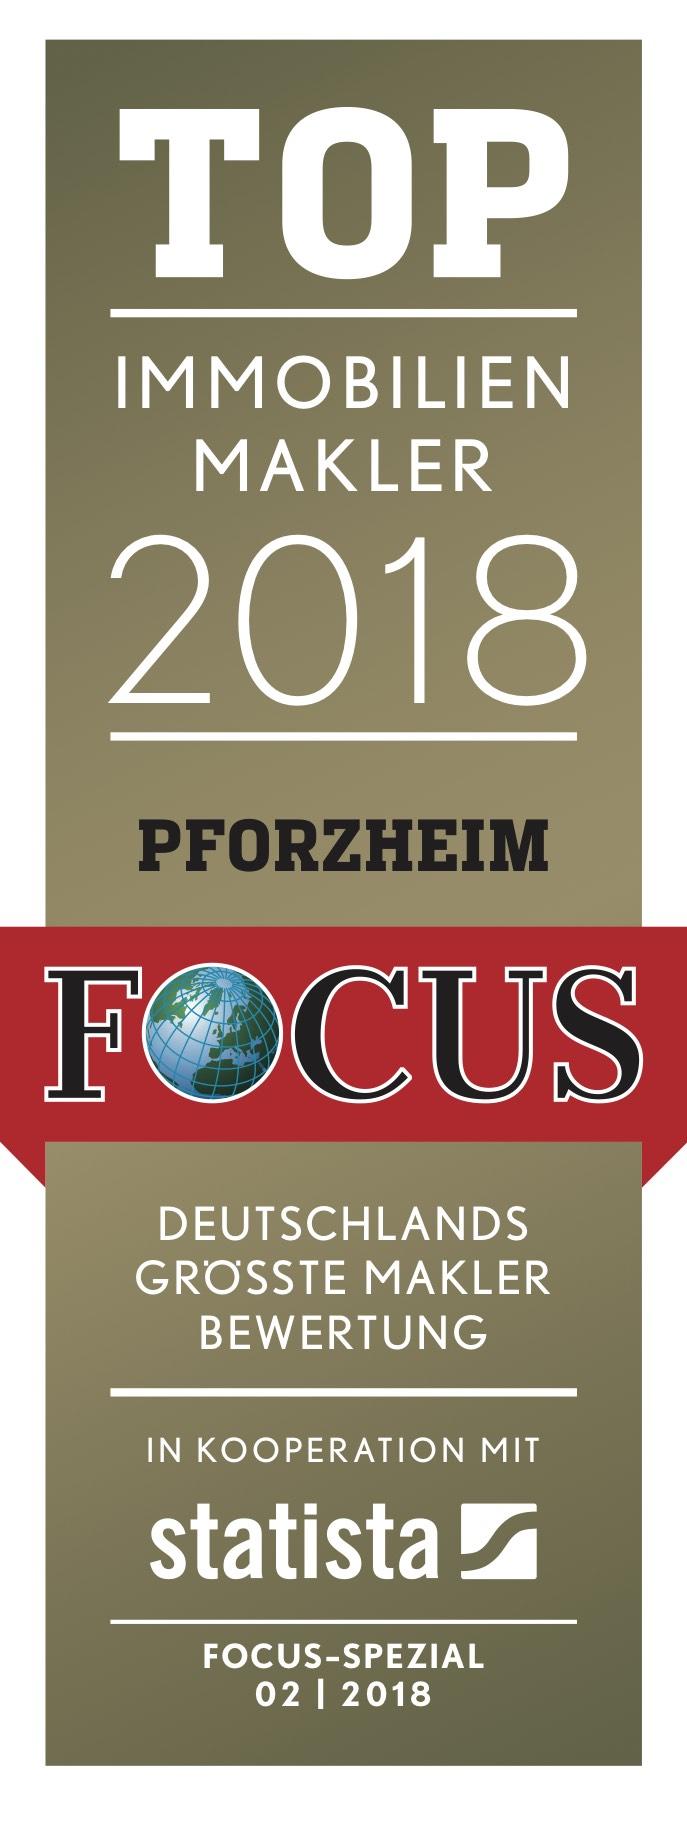 TOP Immobilienmakler Pforzheim Focus Auszeíchnung